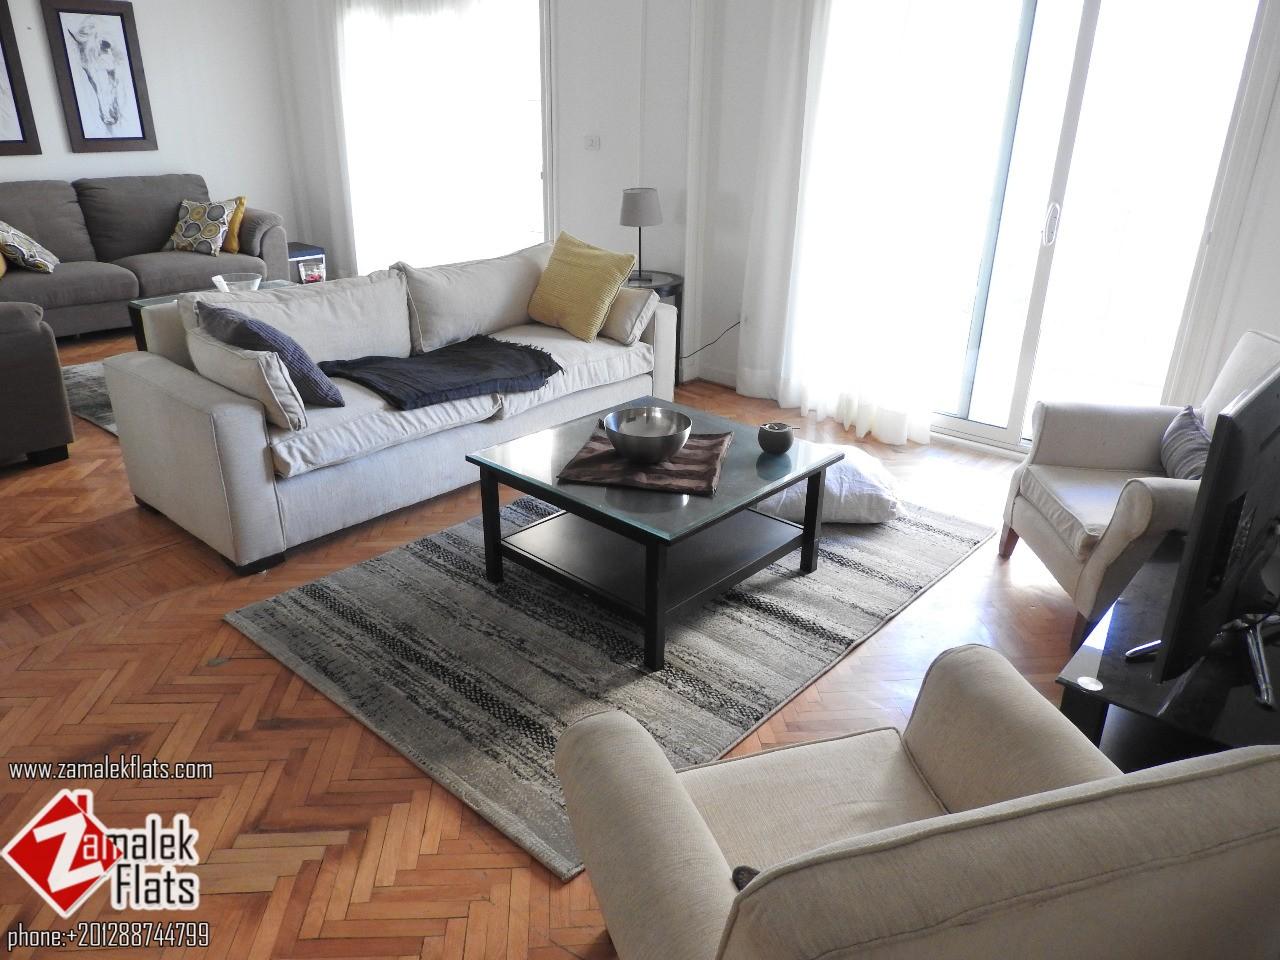 Wonderful Nile View Apartment for Rent in Zamalek